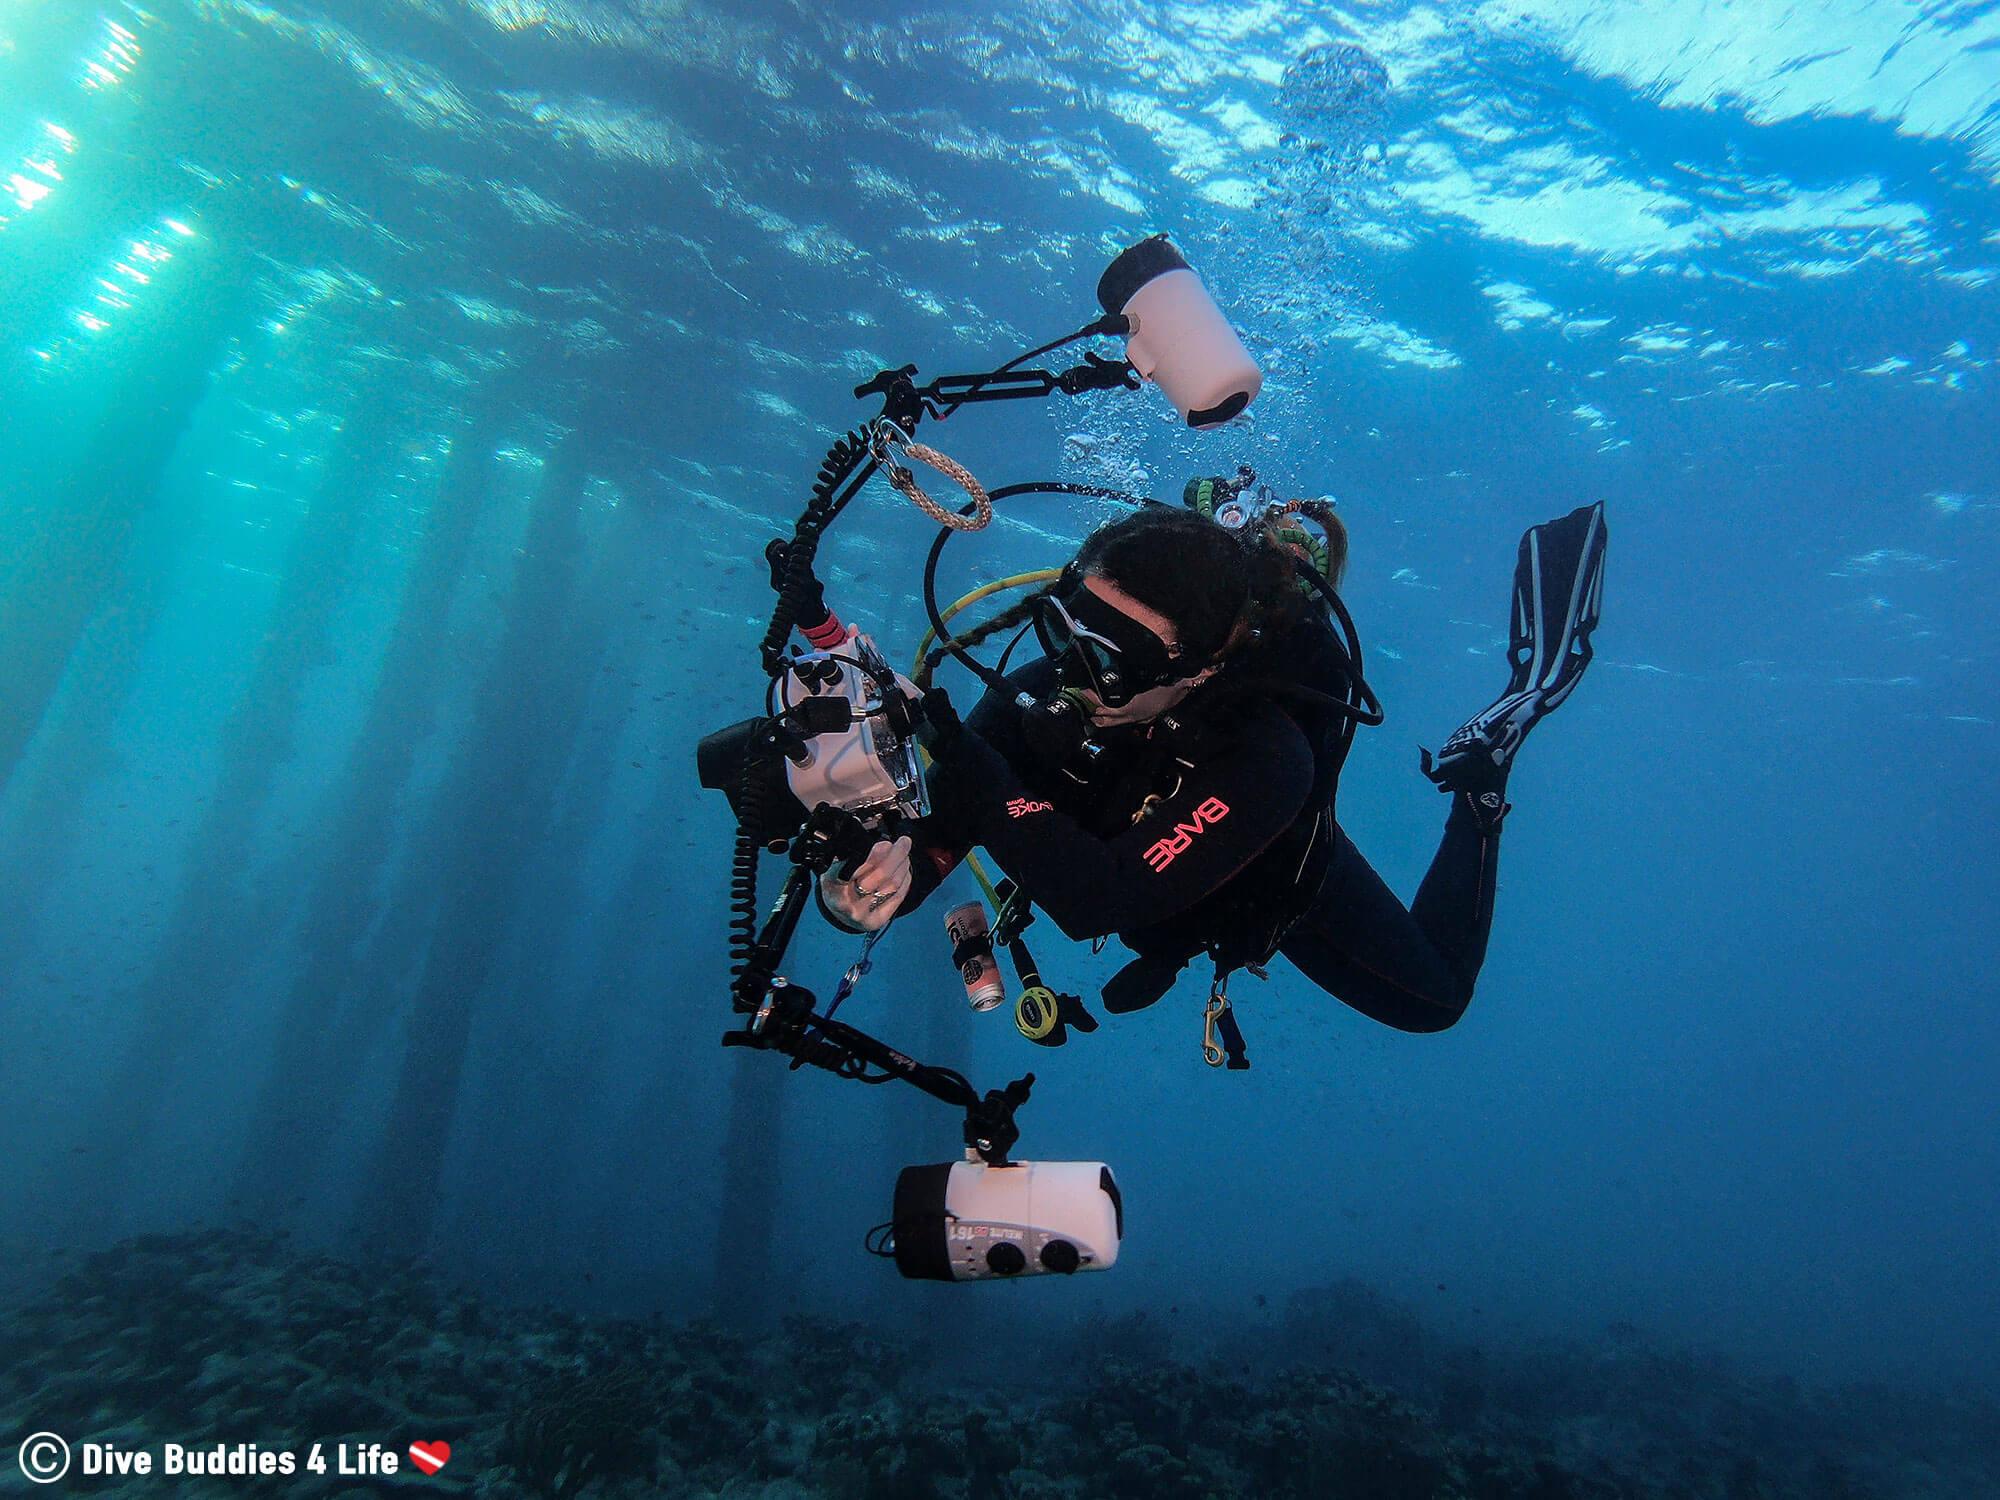 Ali Scuba Diving With Her Underwater Camera At Salt Pier Dive Site, Bonaire, Caribbean